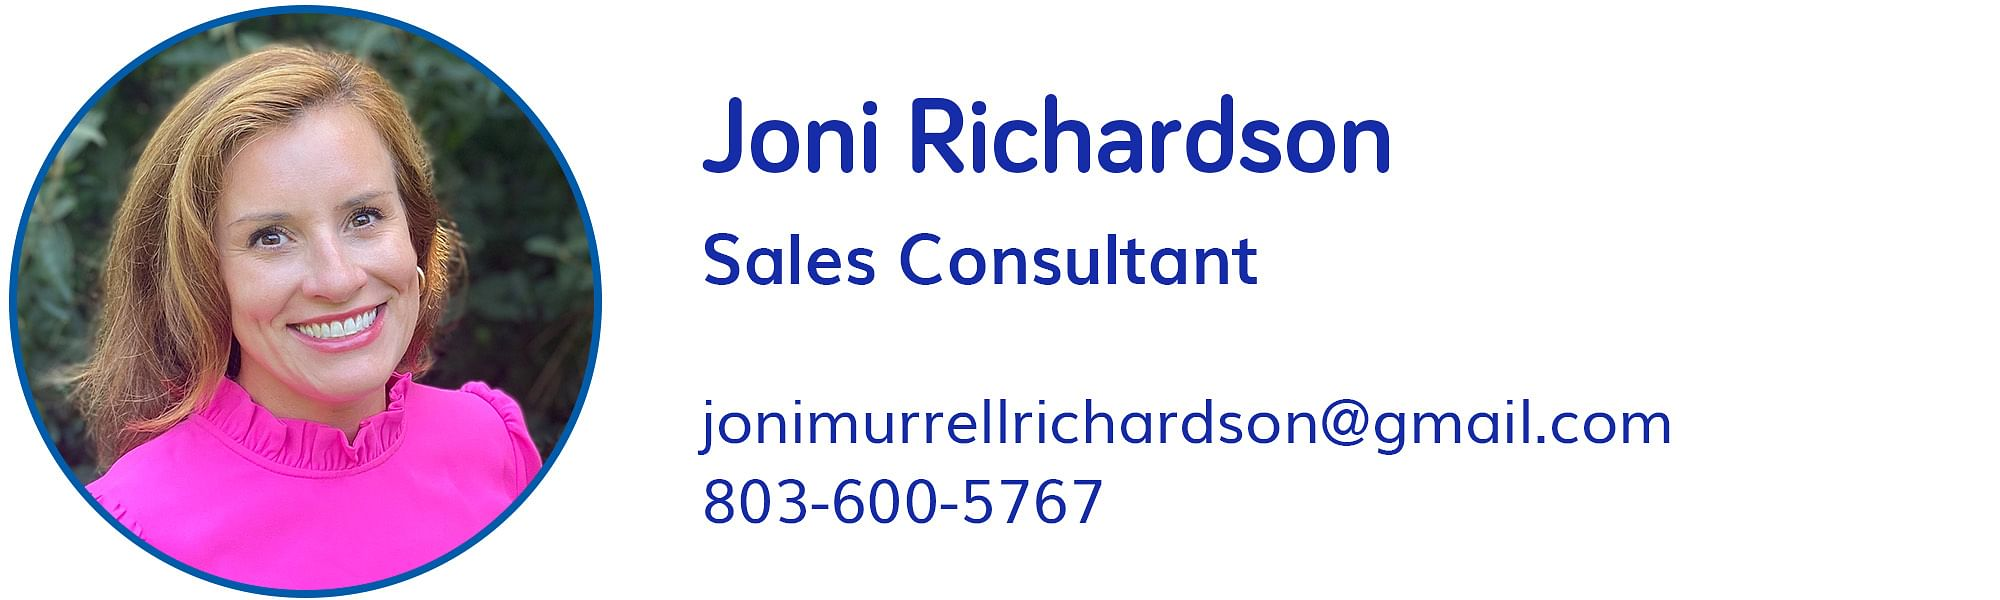 Joni Richardson, jonimurrellrichardson@gmail.com, 803-600-5767